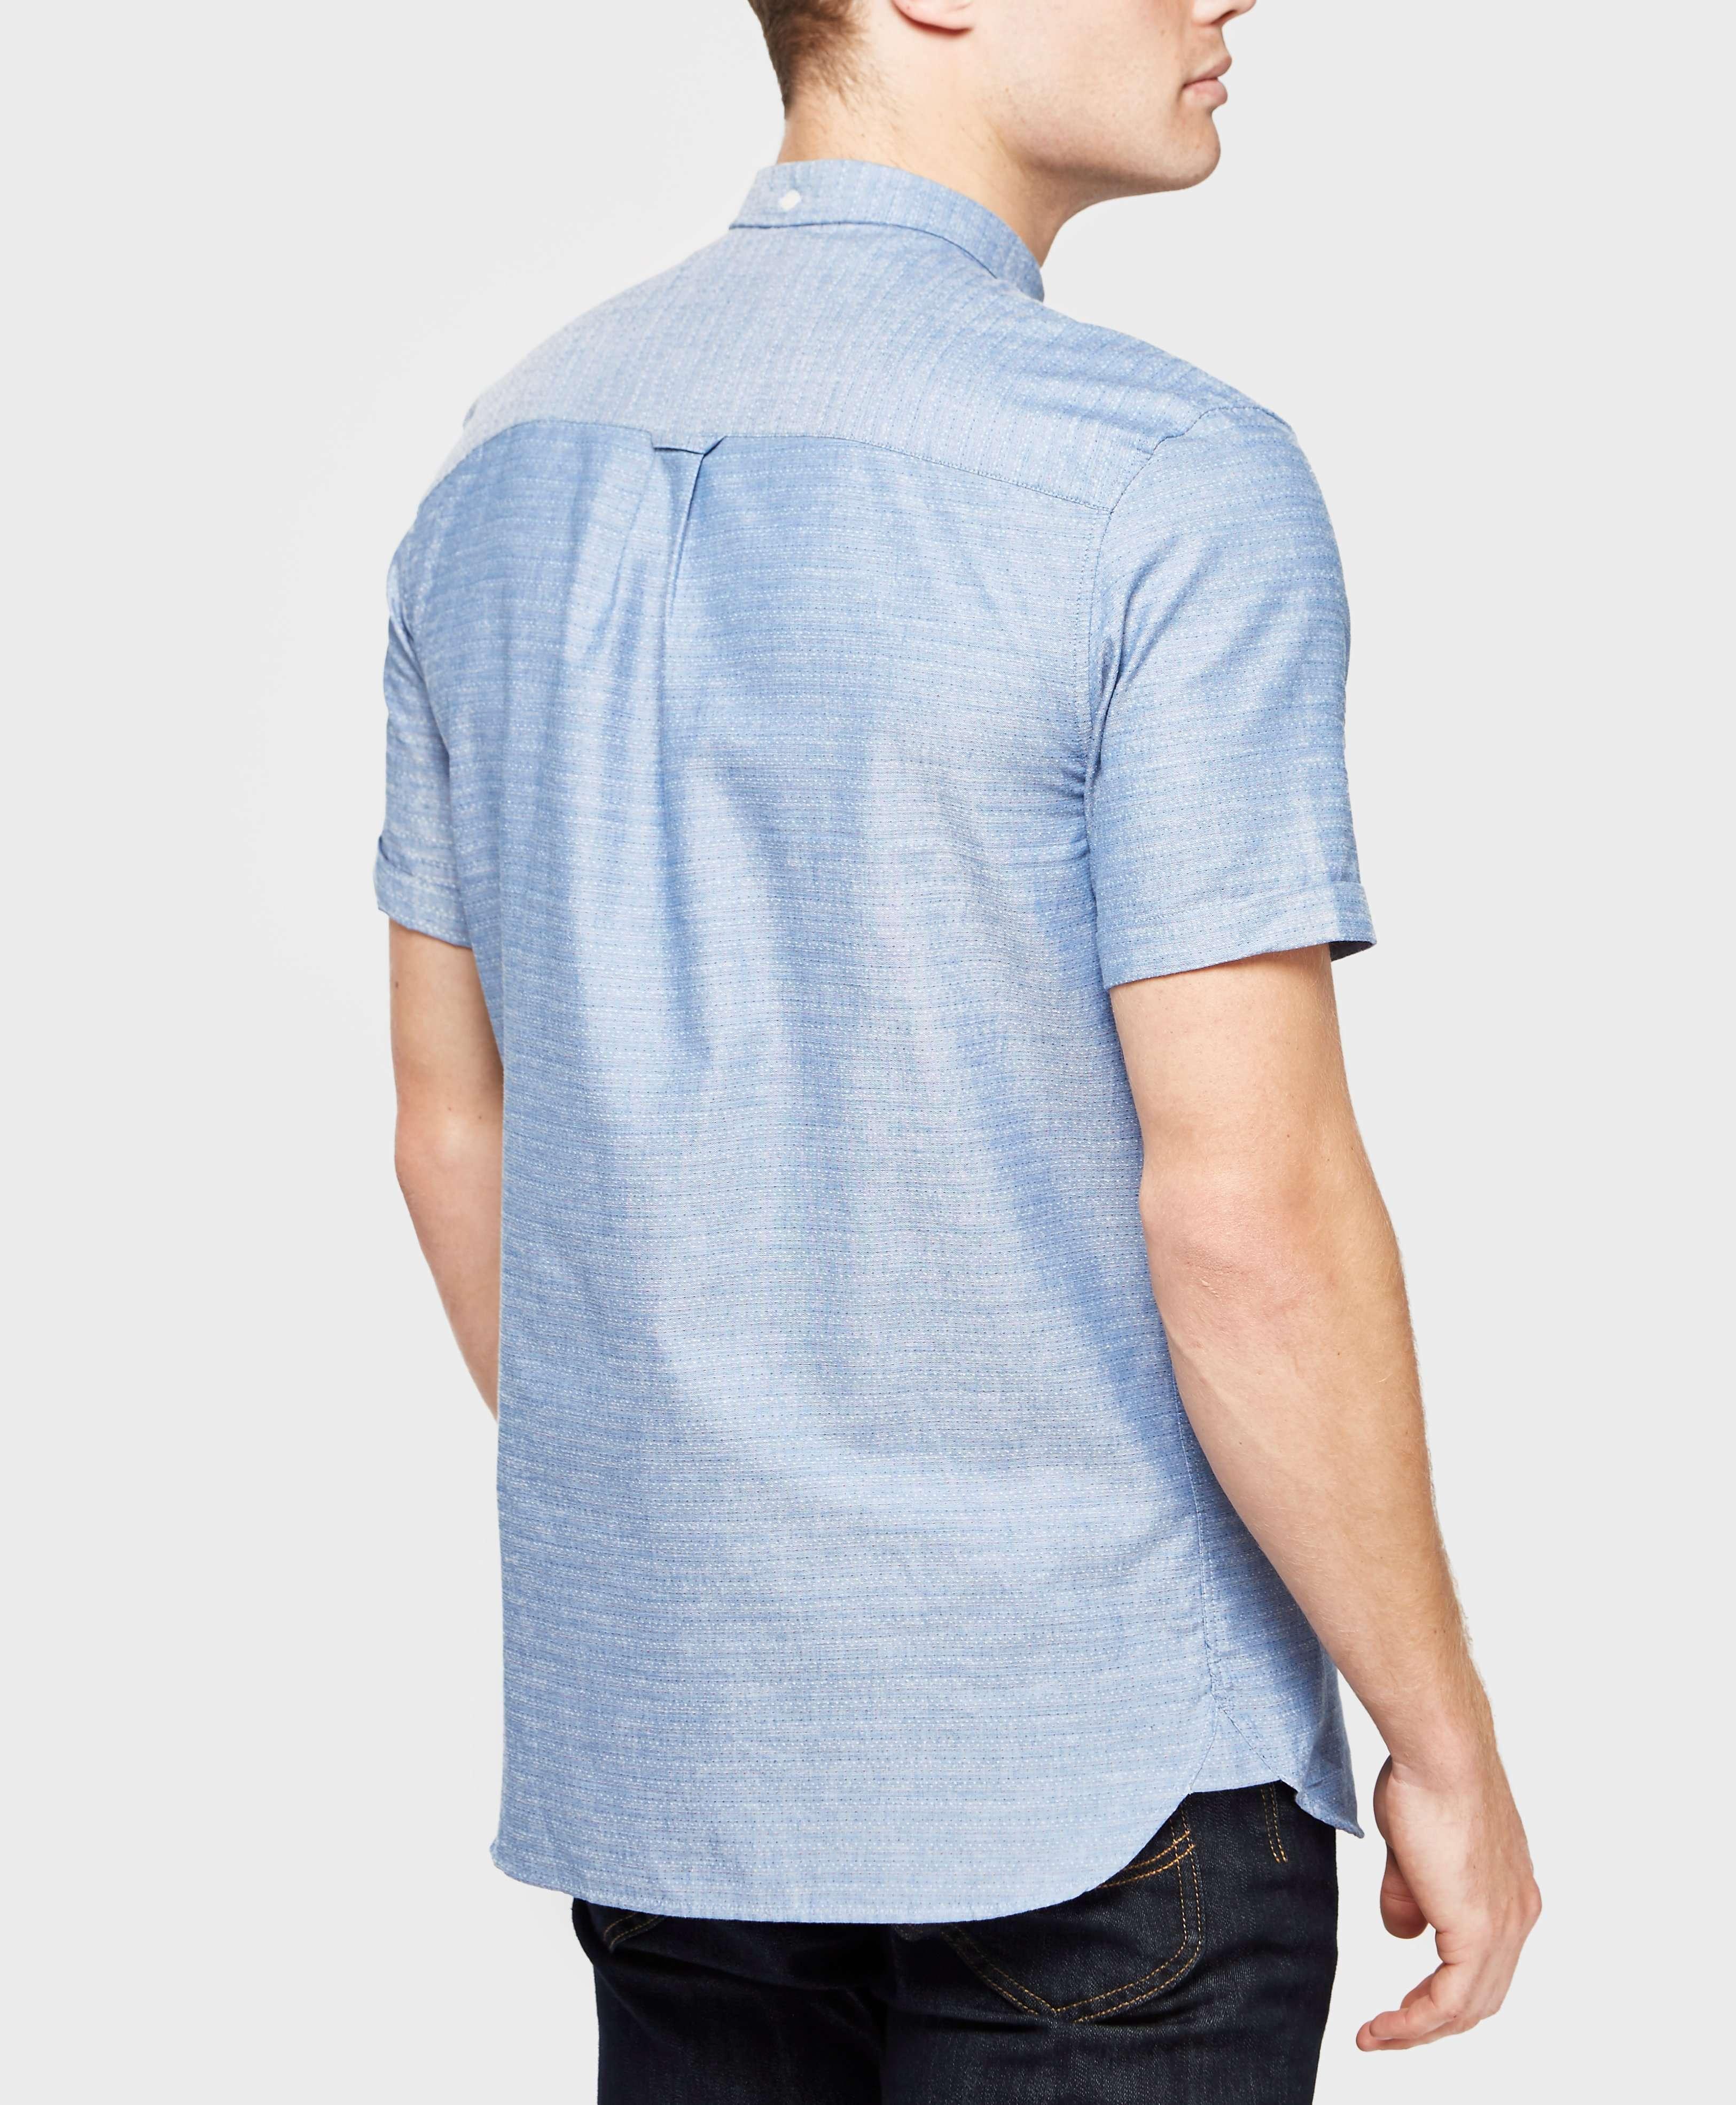 Lyle & Scott Running Stitch Short Sleeve Shirt